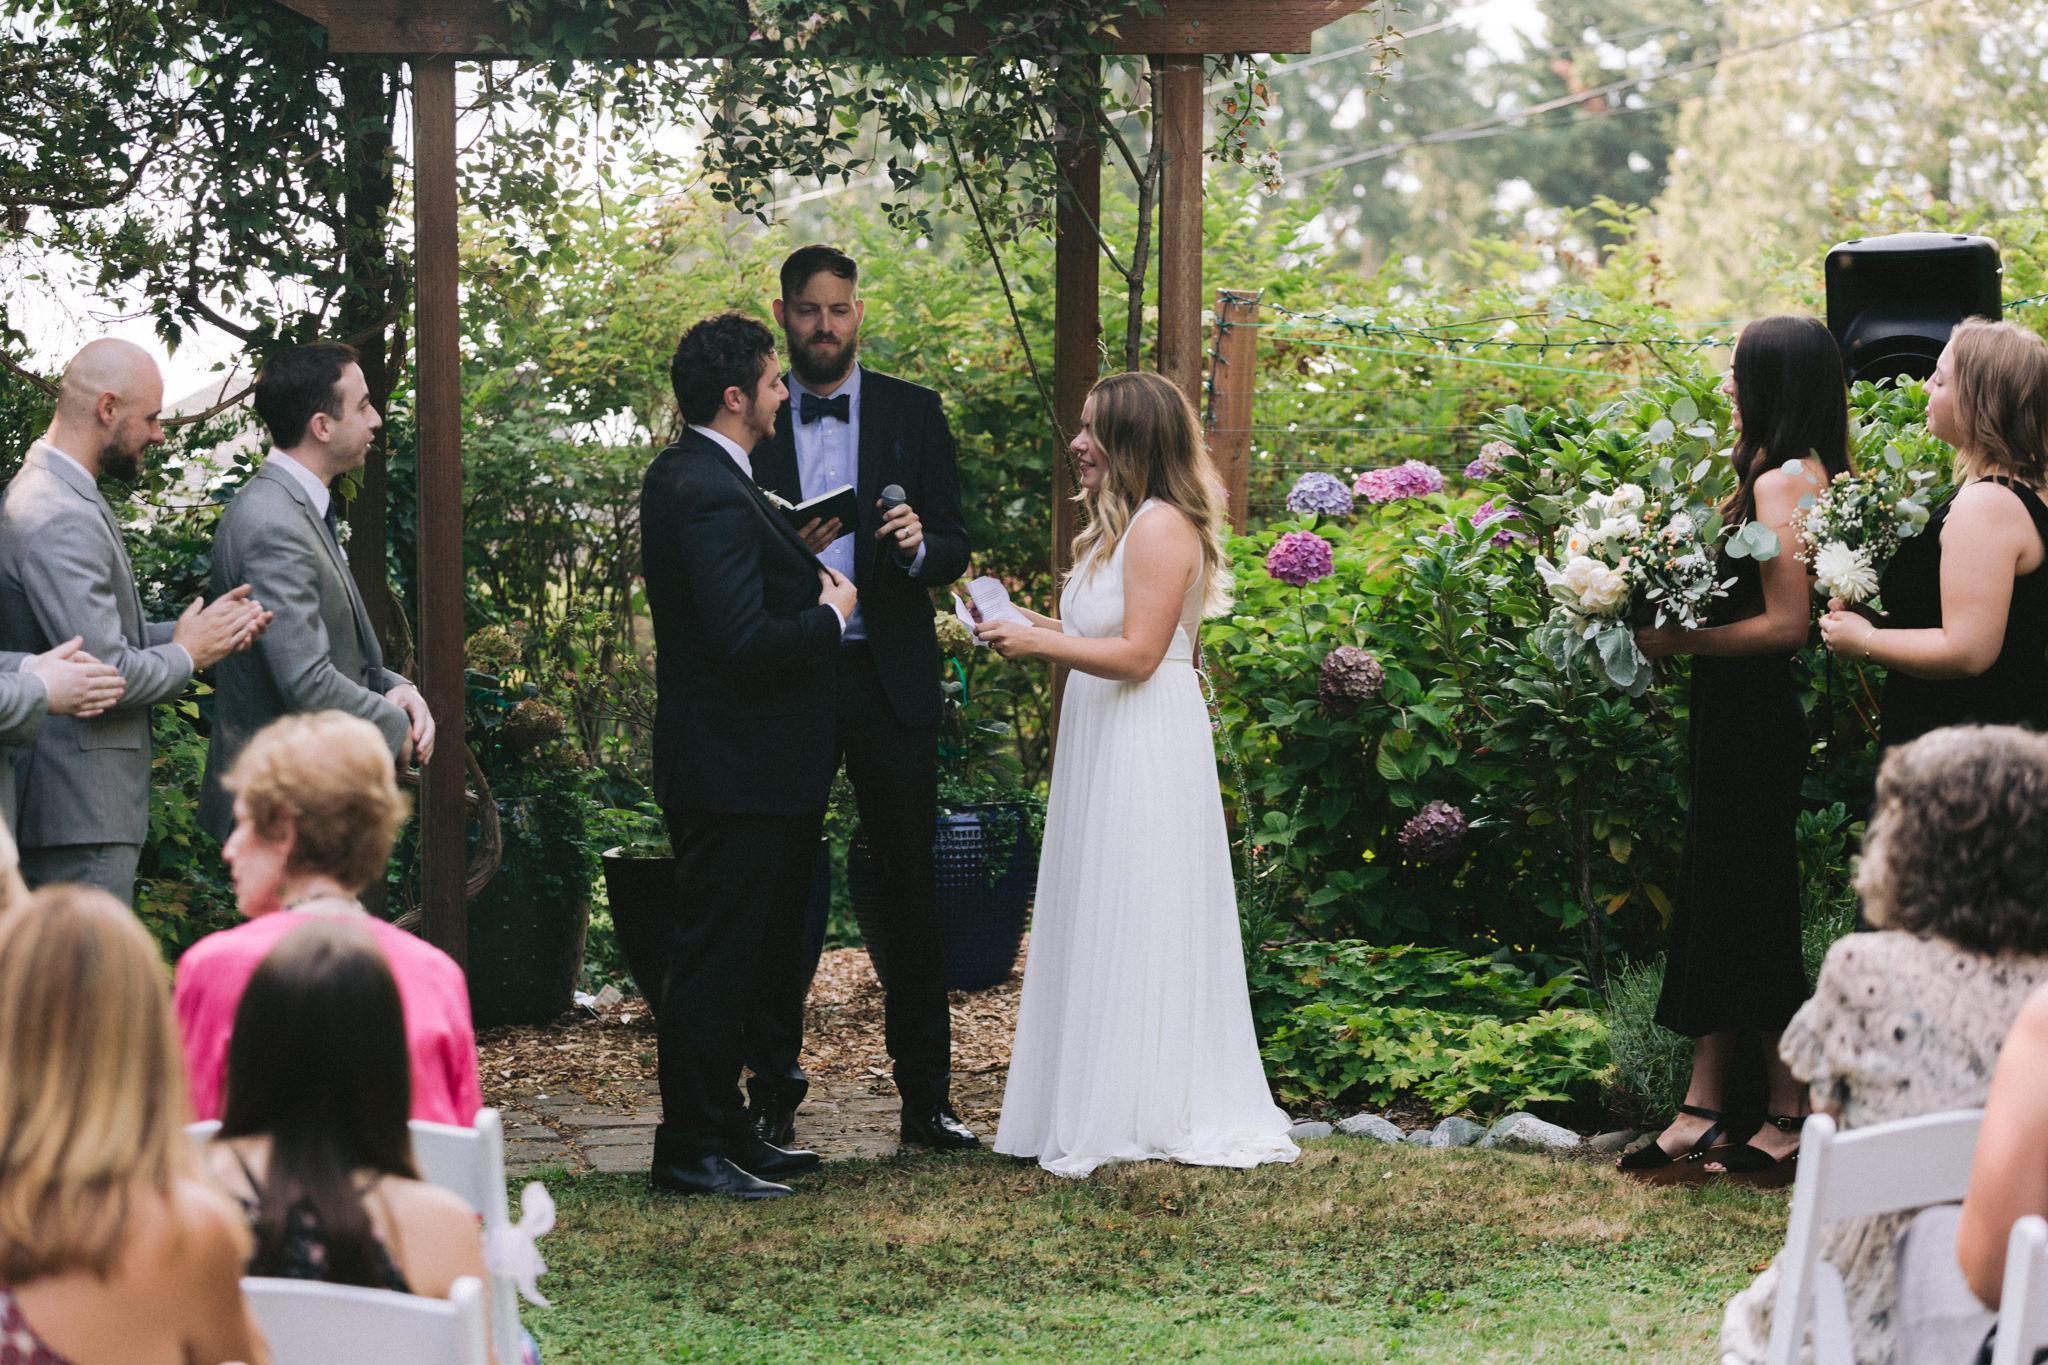 Backyard-Bainbridge-Island-Wedding-Alycia-Lovell-Photography-109.JPG